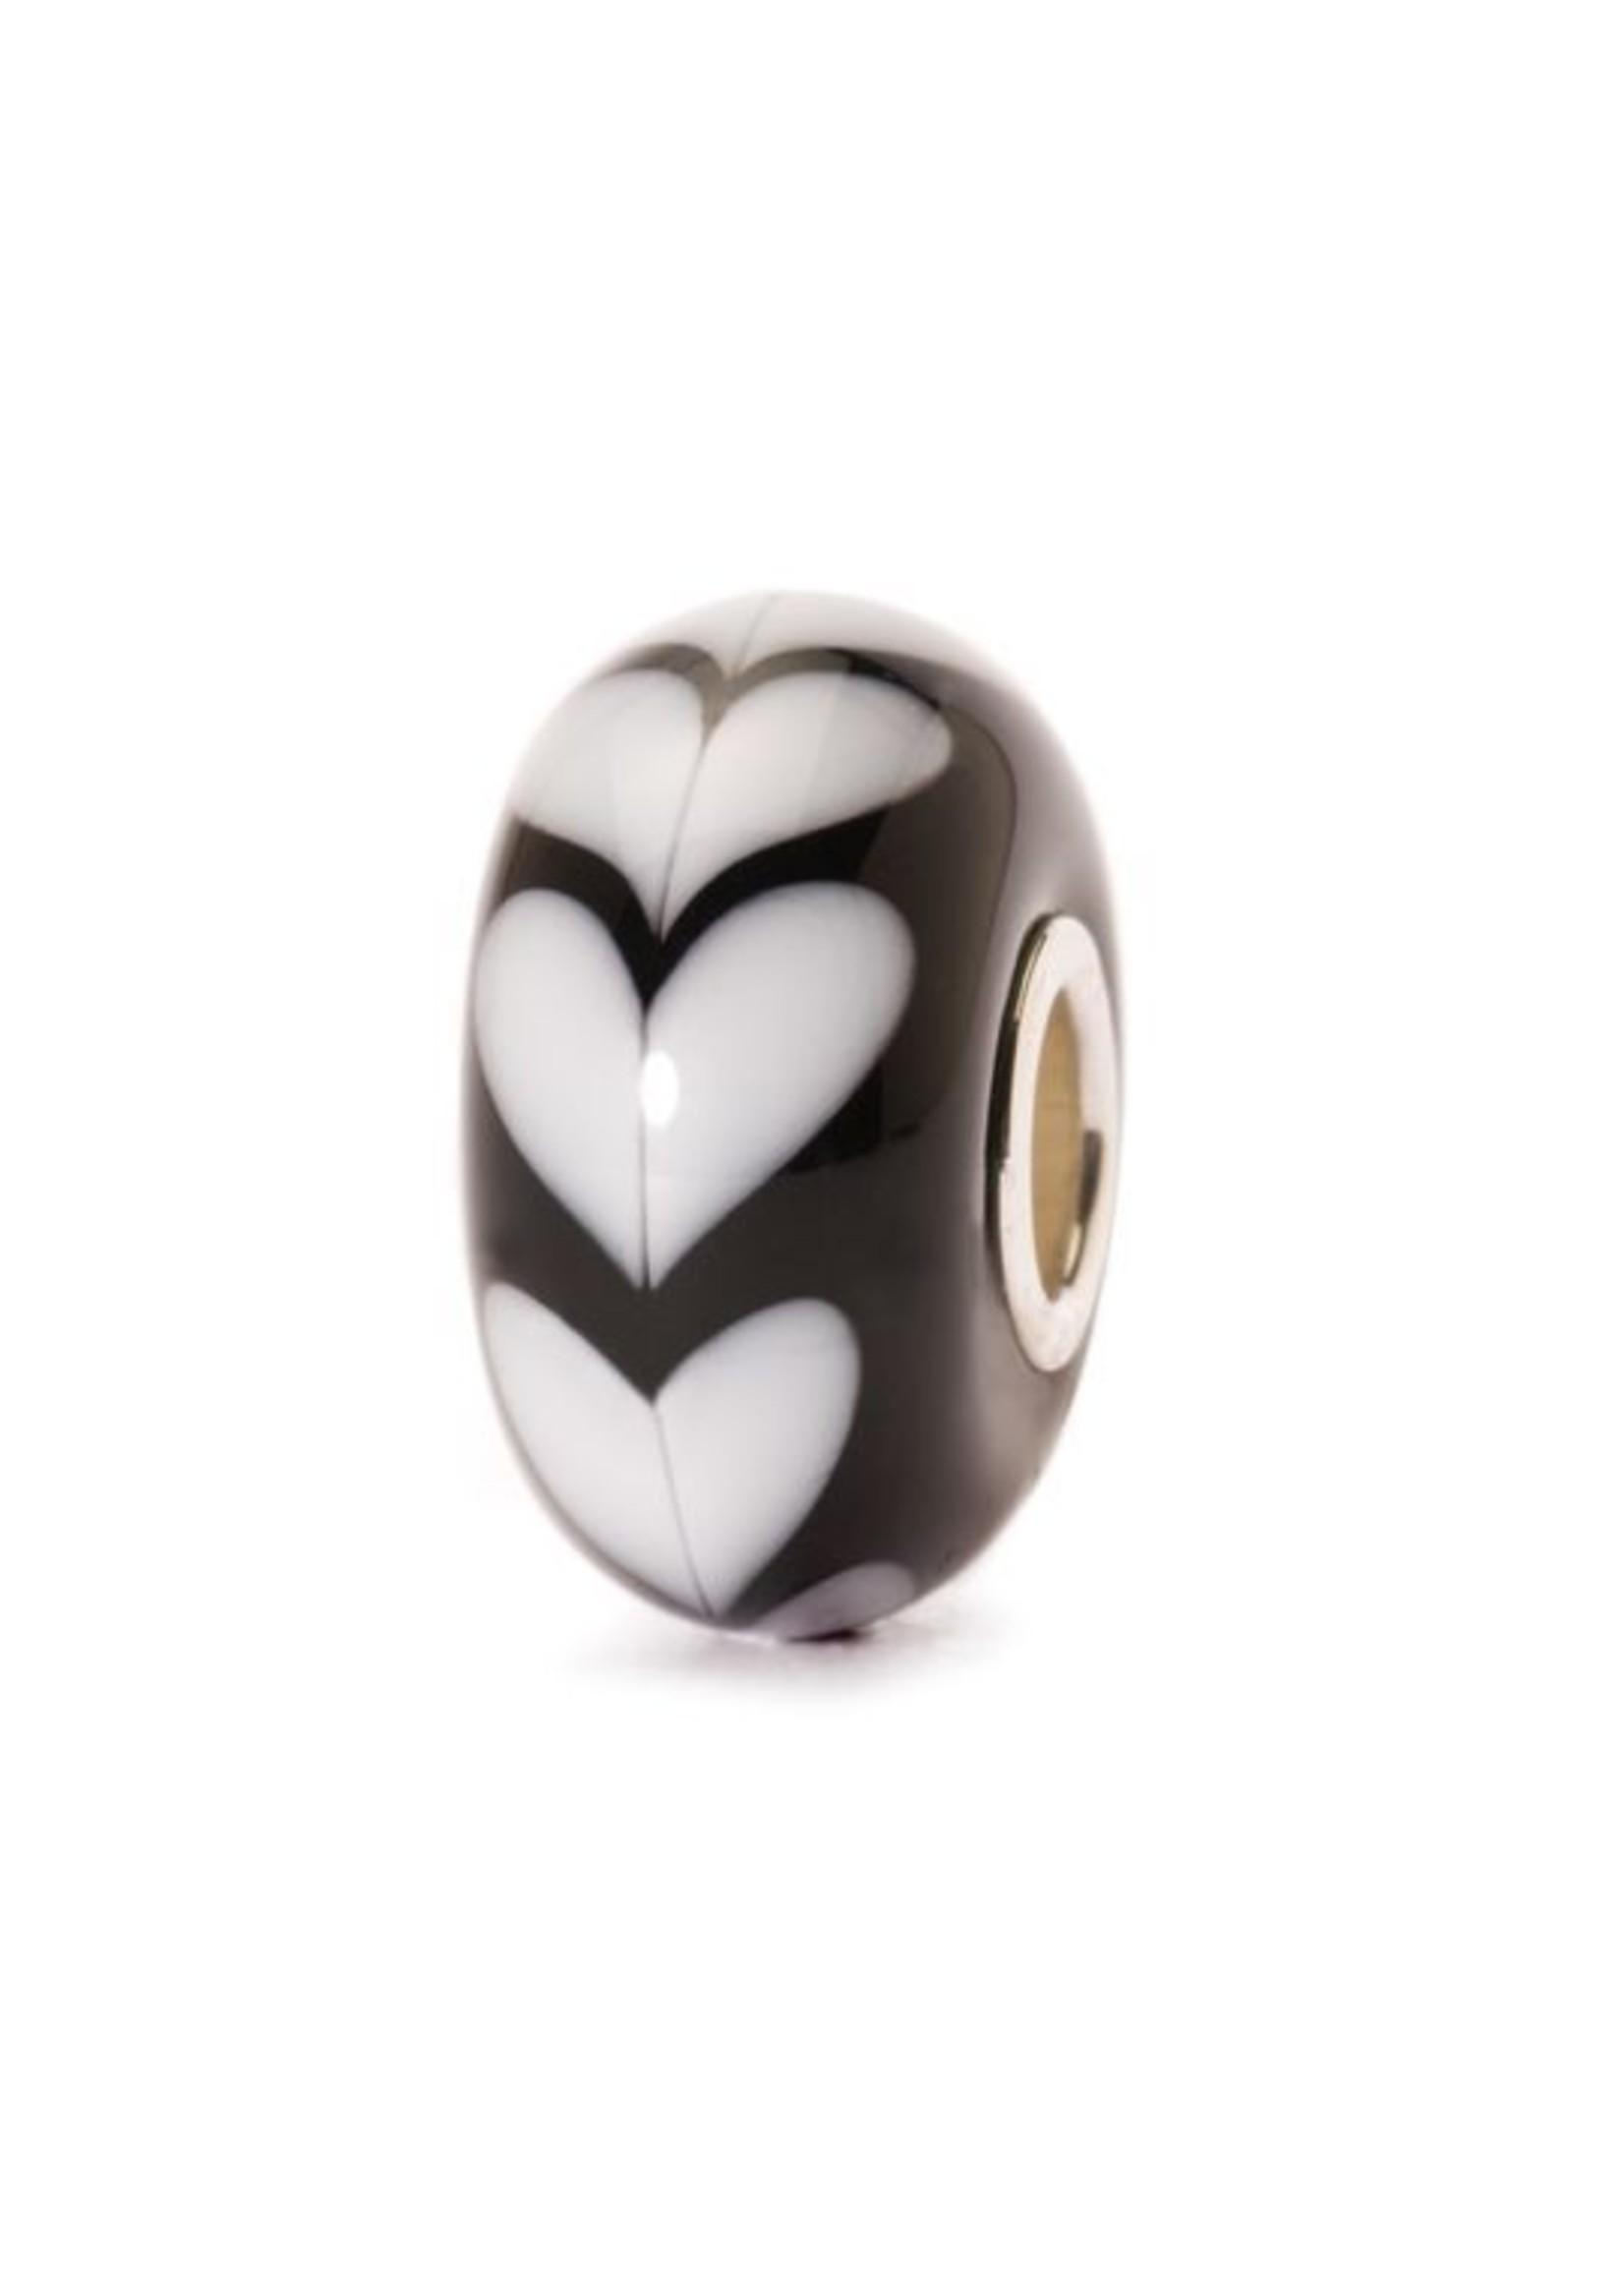 Trollbeads White Heart, Glass